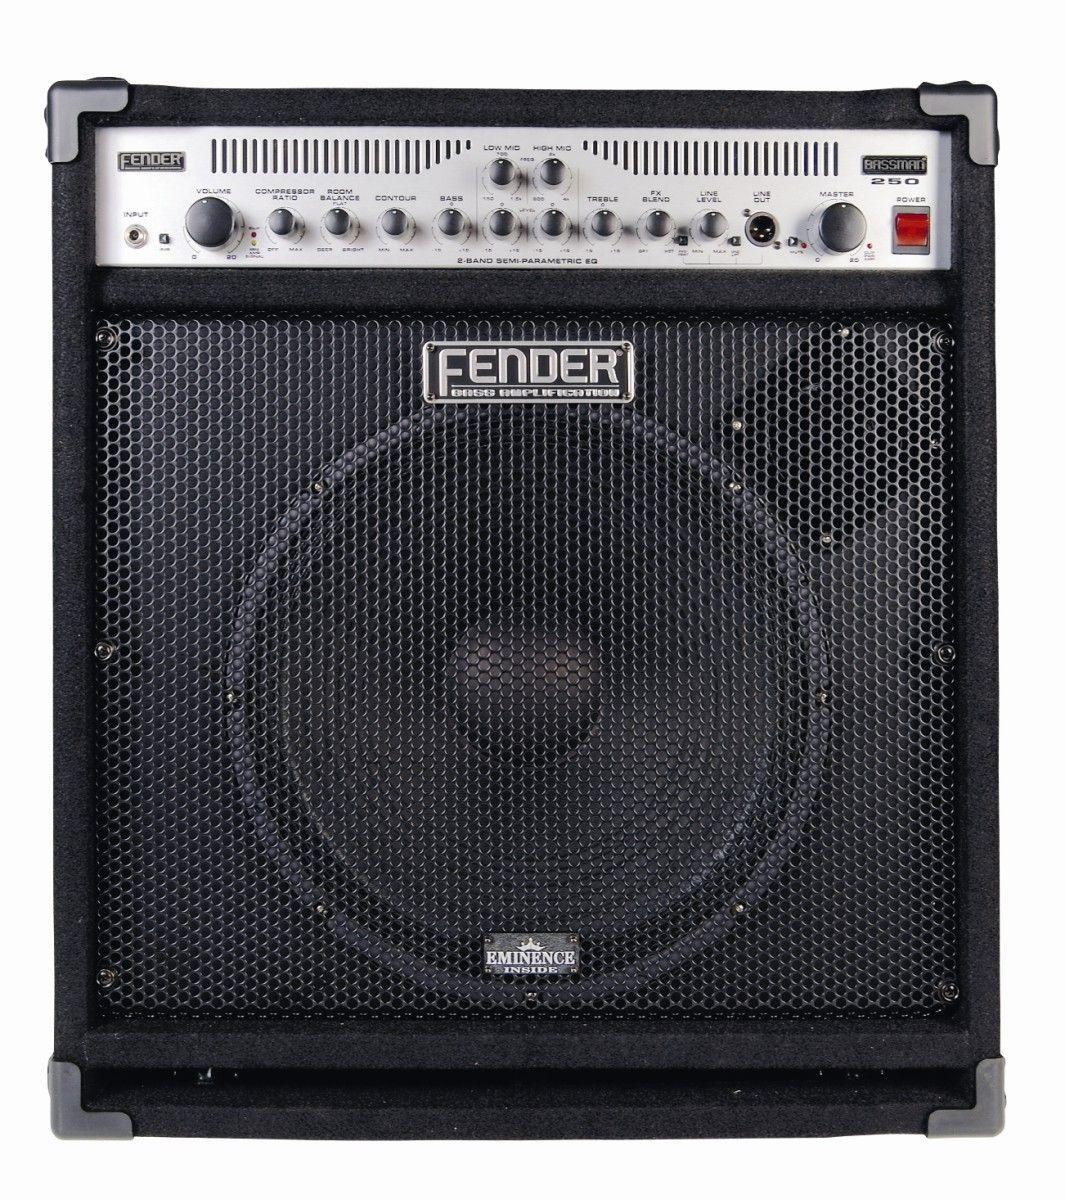 fender bassman 250 115 bass combo review musicradar. Black Bedroom Furniture Sets. Home Design Ideas